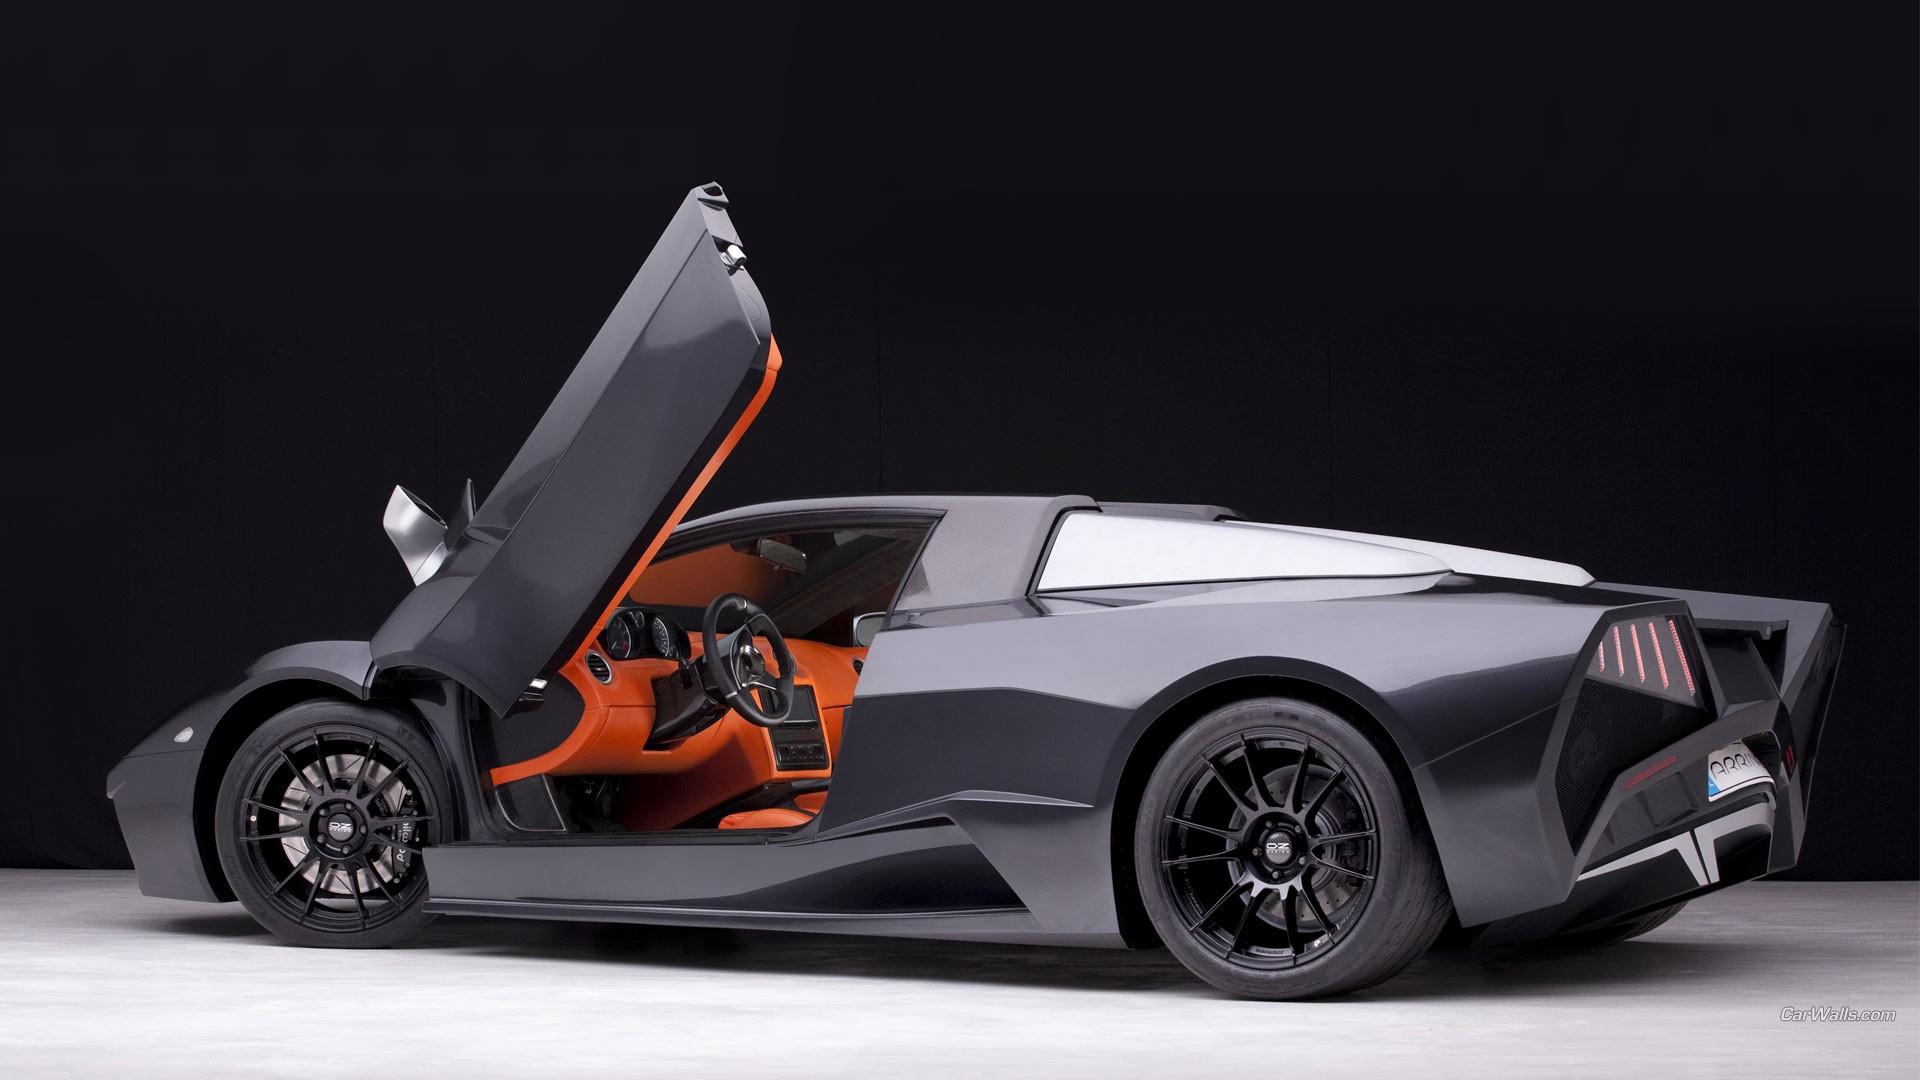 Wallpaper Supercars Lamborghini Aventador Sports Car